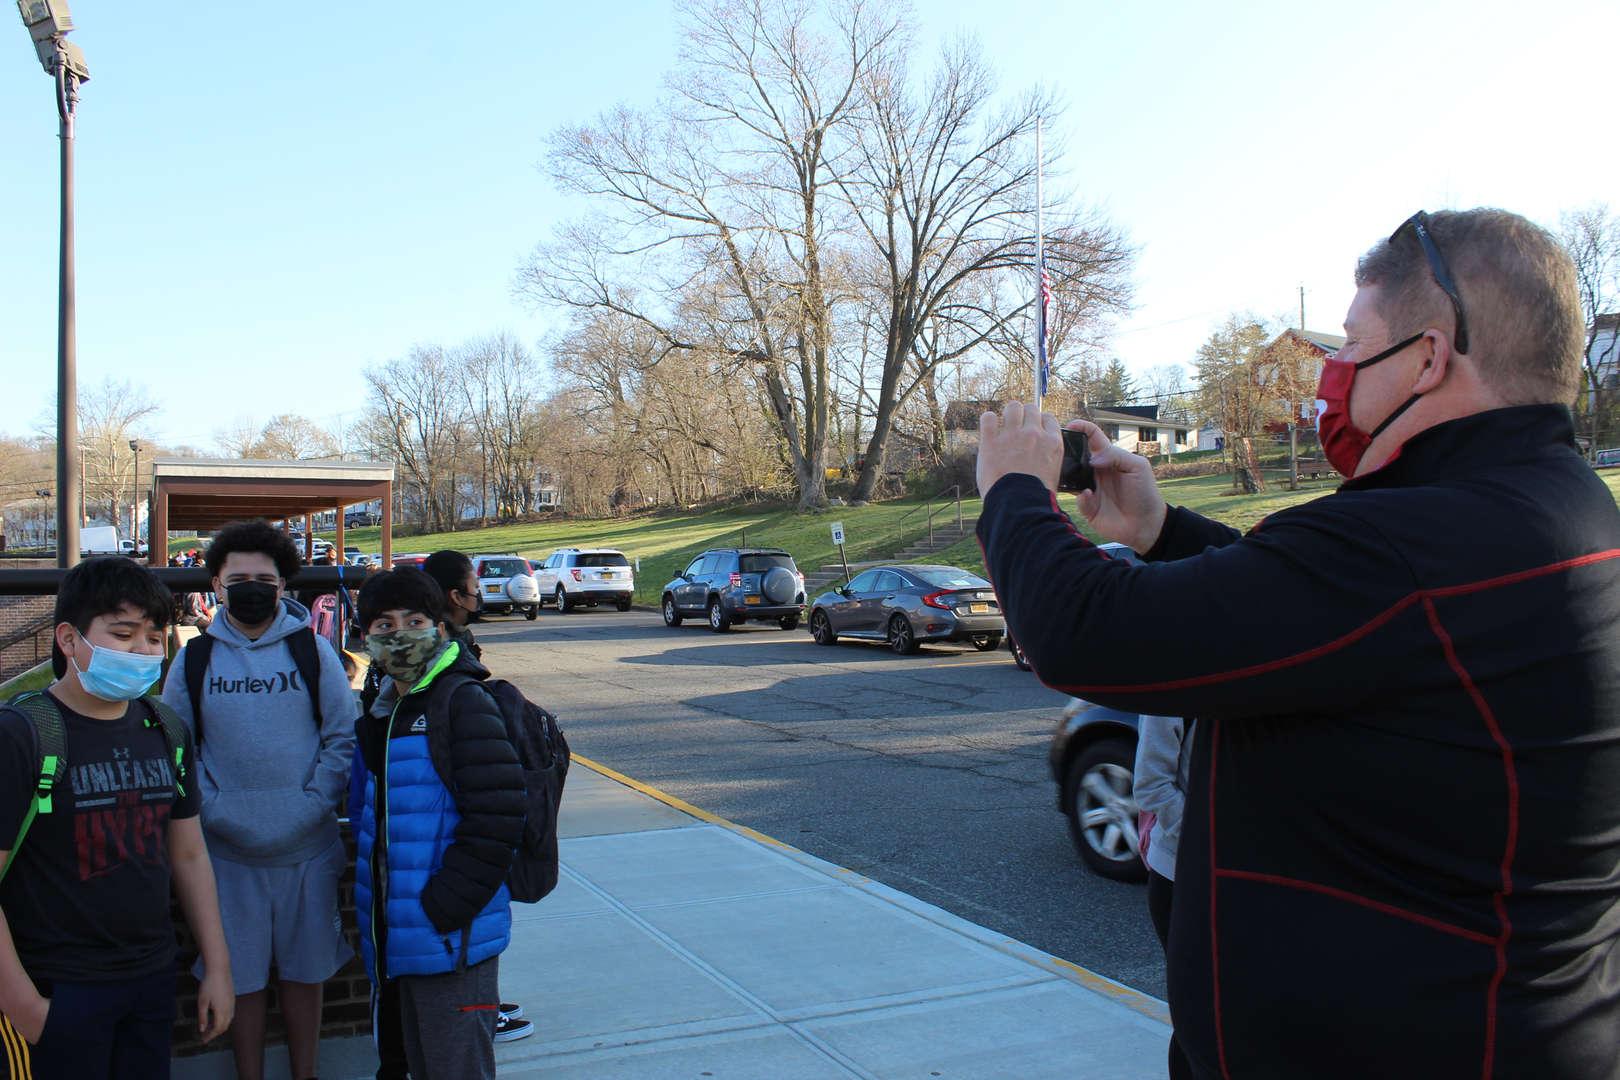 Principal taking a photo of students